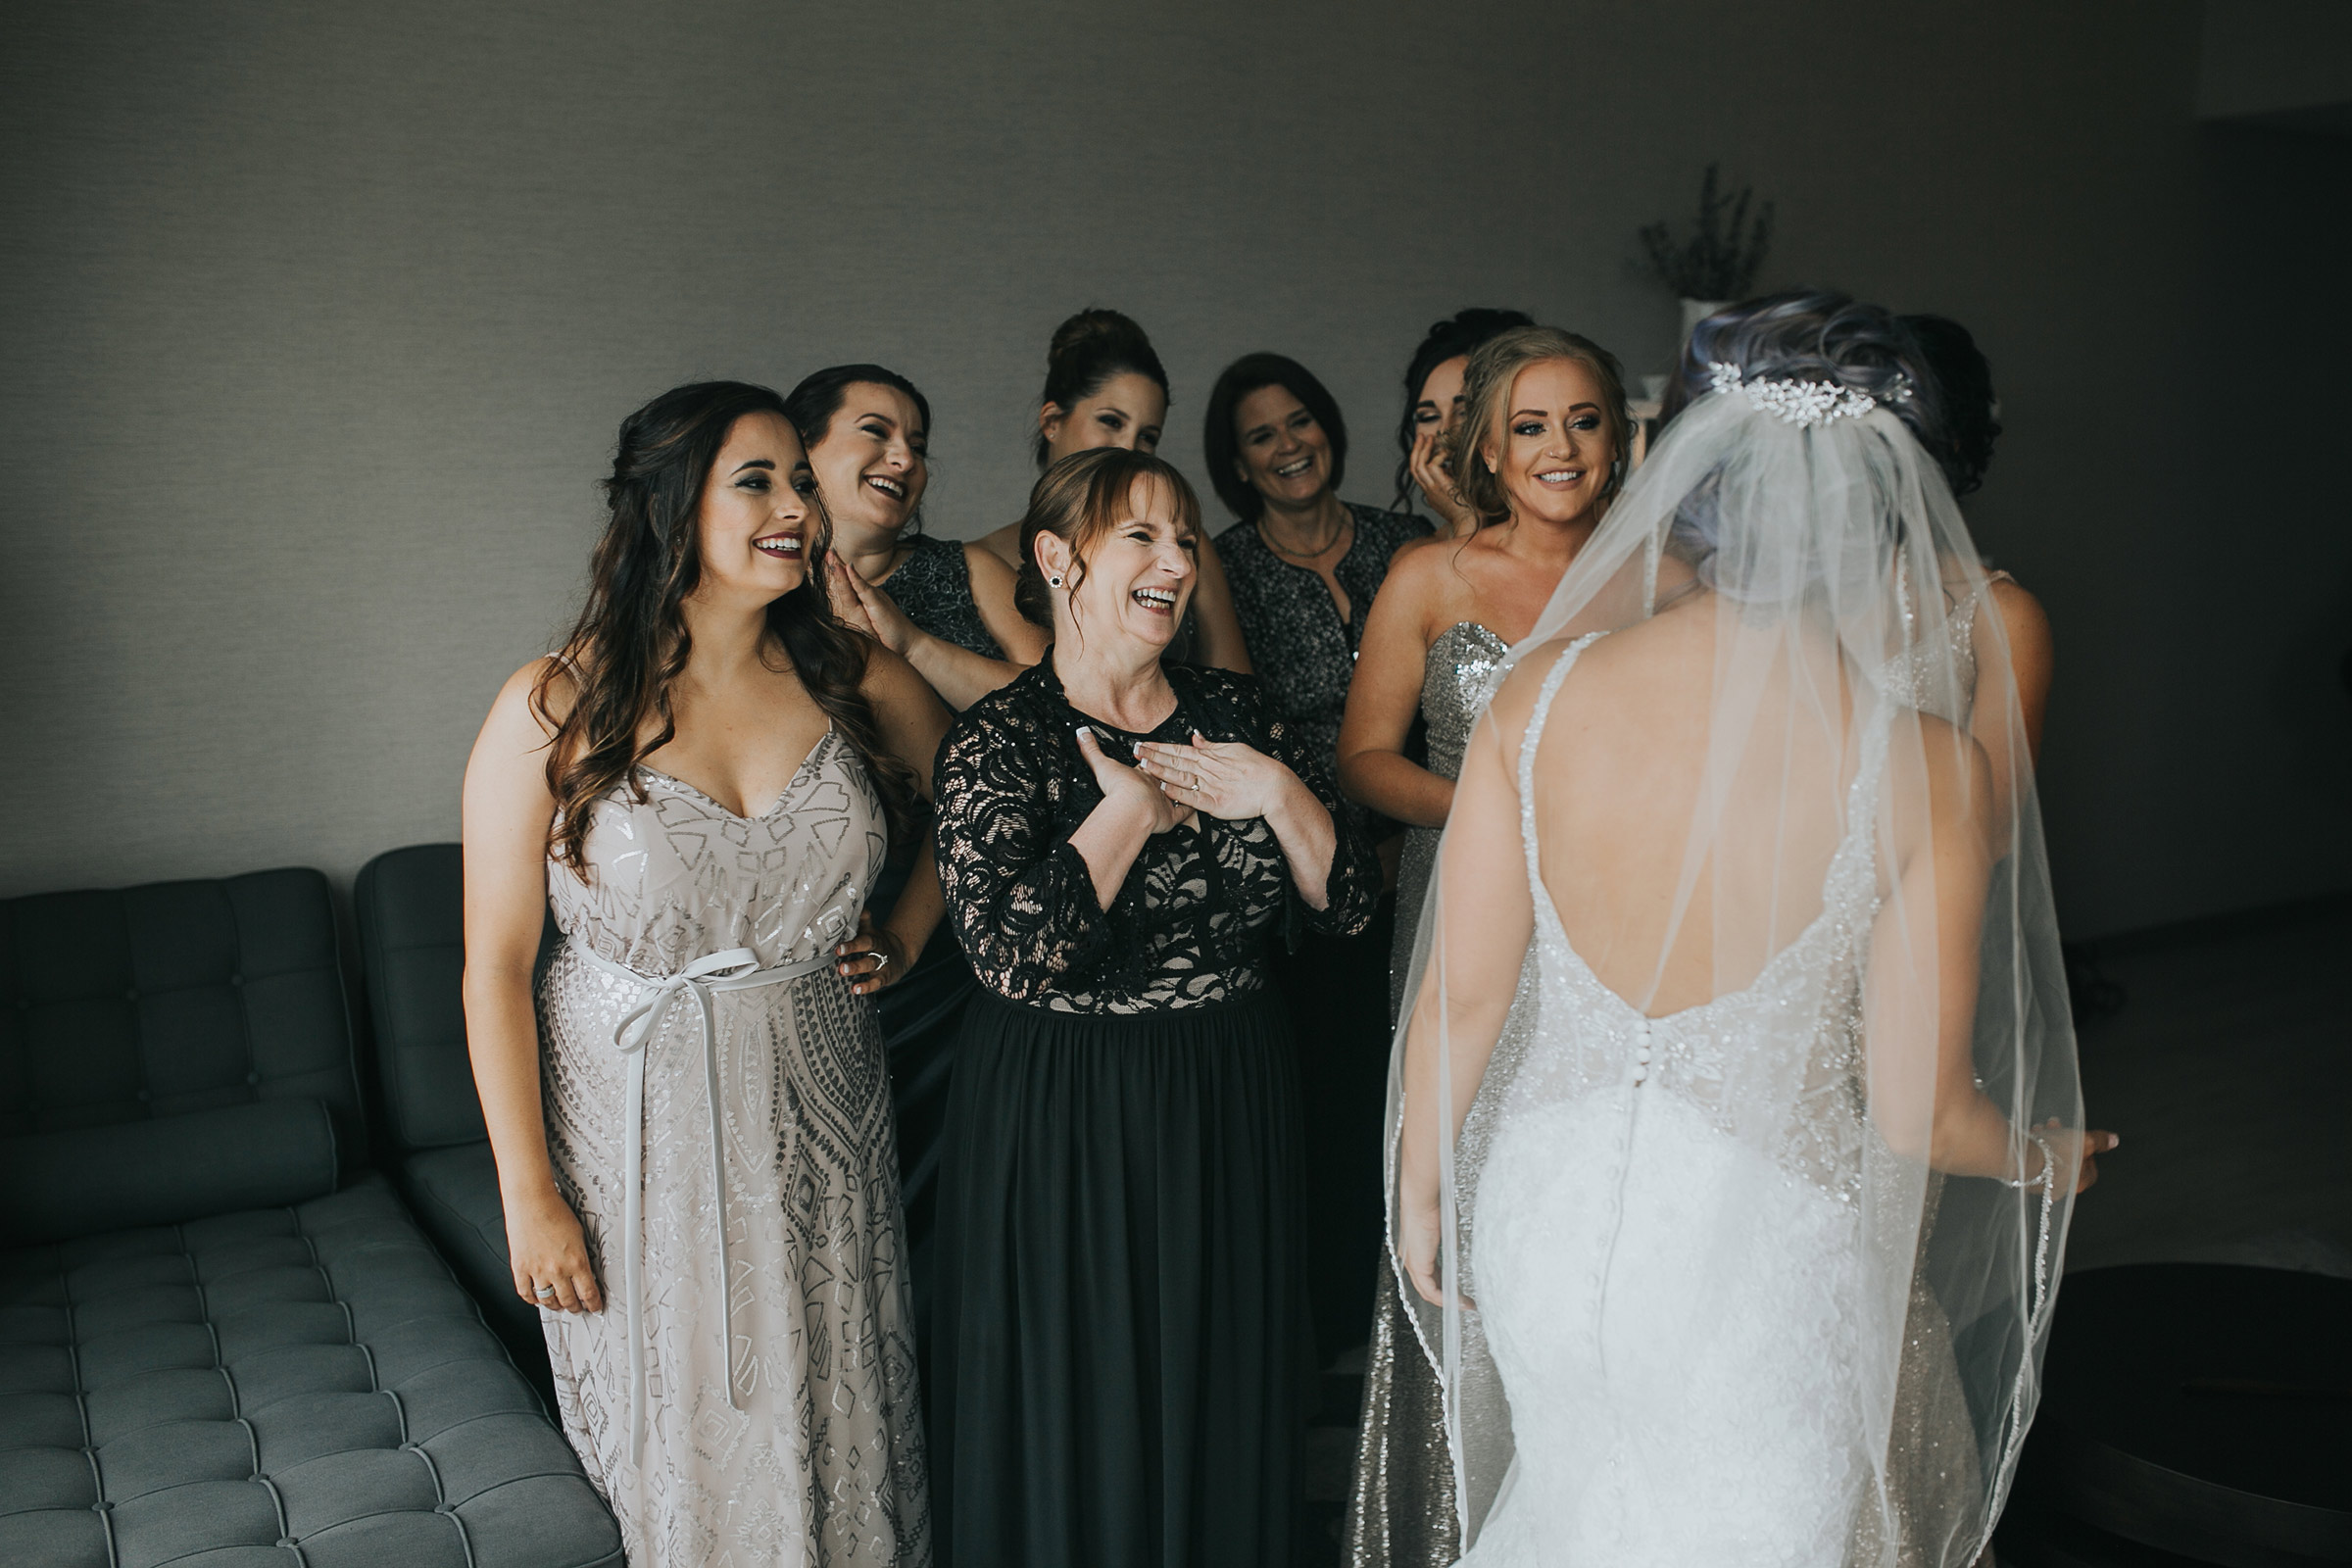 girls-reacting-to-brides-dress-desmoines-iowa-ac-hotel-raelyn-ramey-photography.jpg